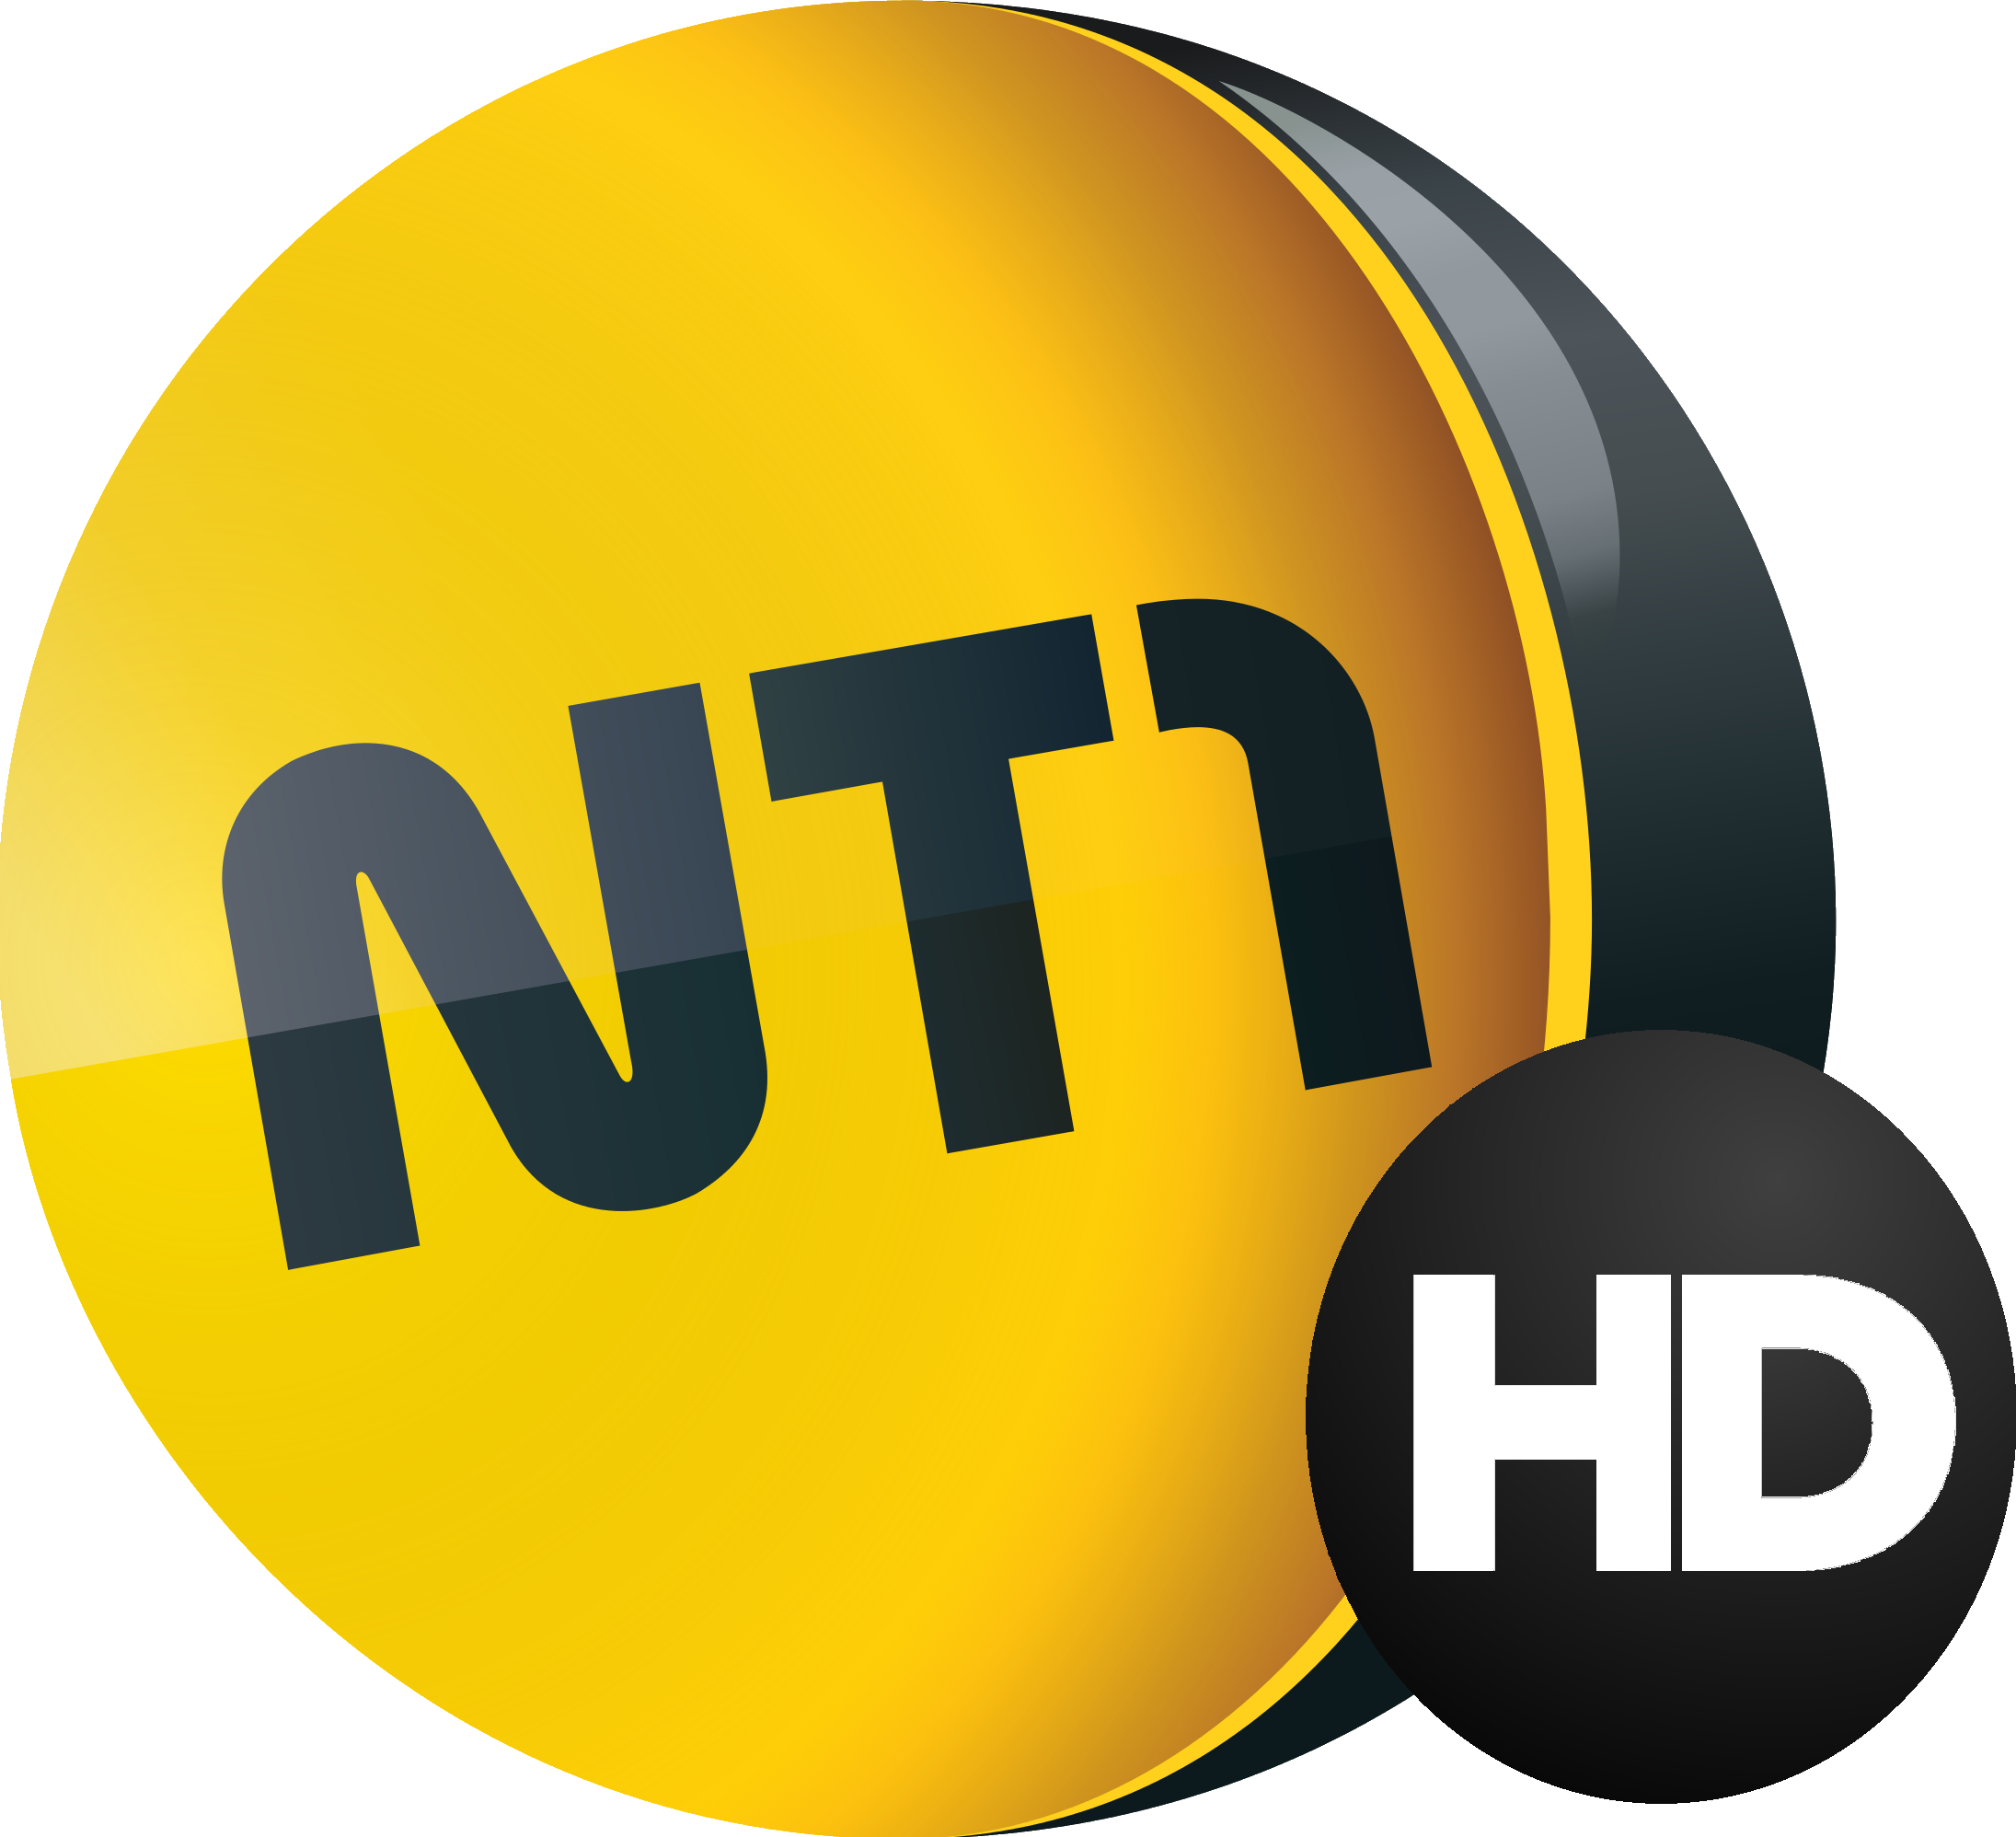 NT1 HD logo